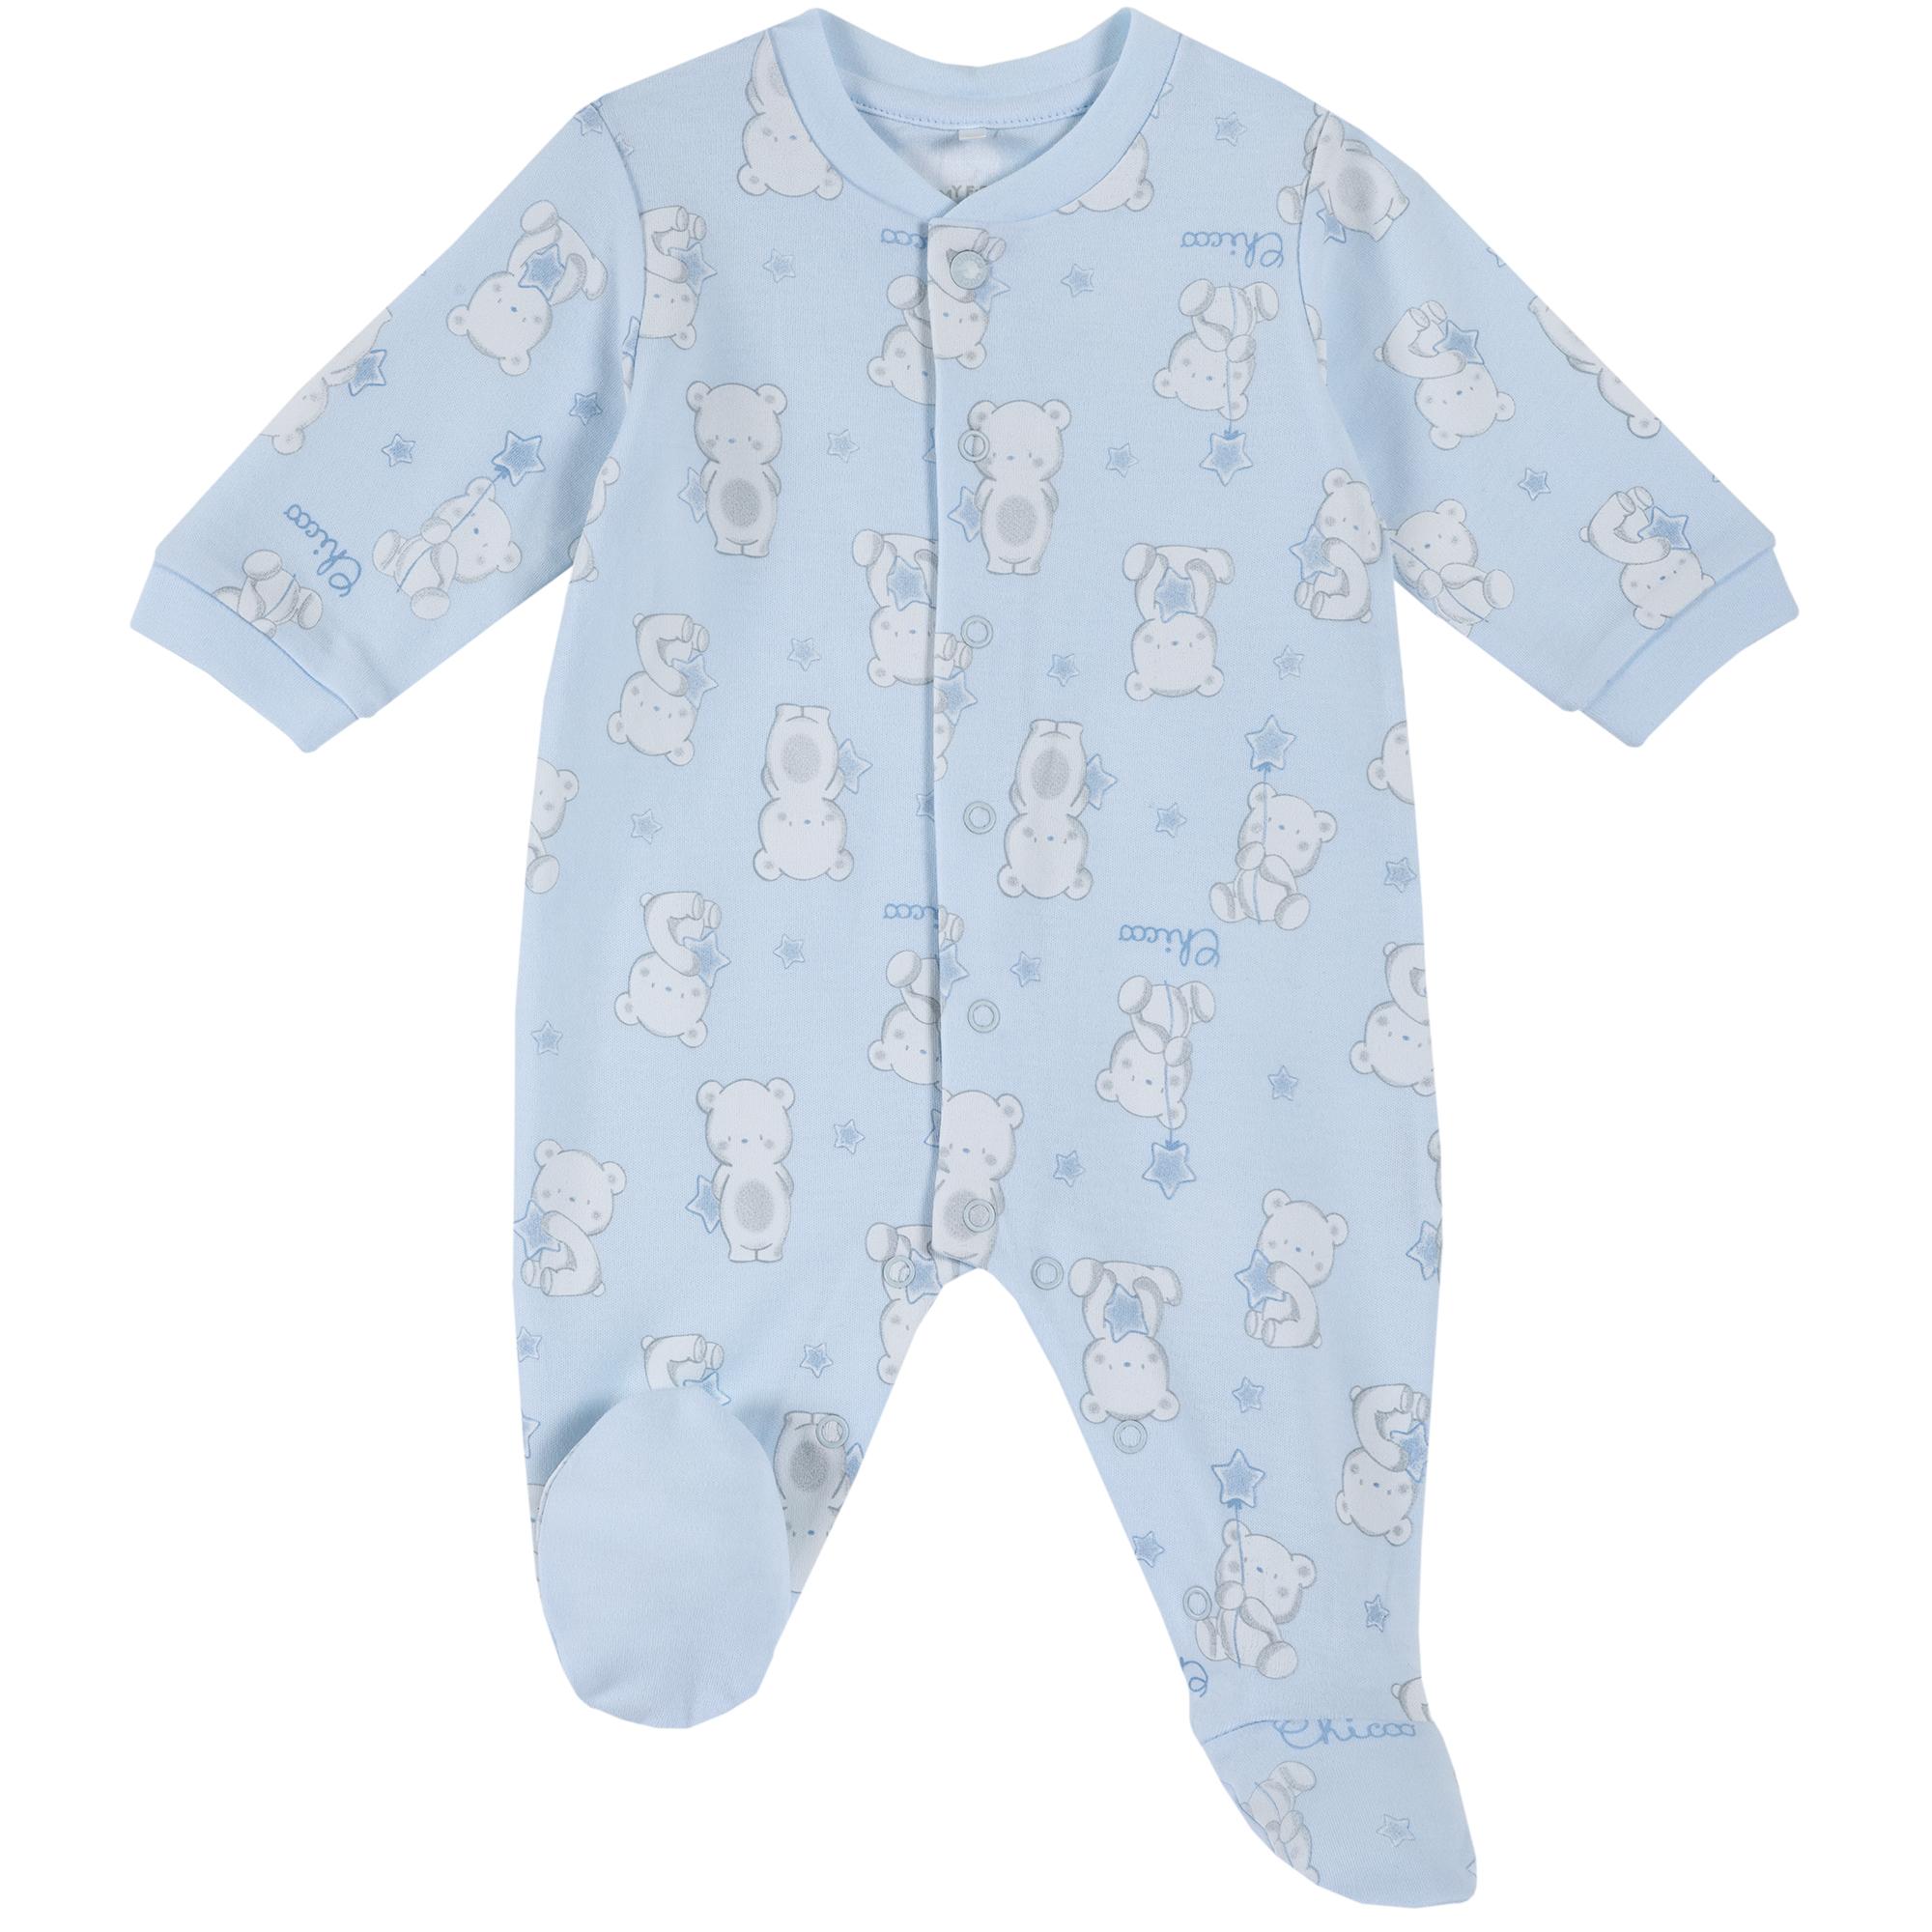 Salopeta copii Chicco, bleu, imprimeu ursuleti, 21862